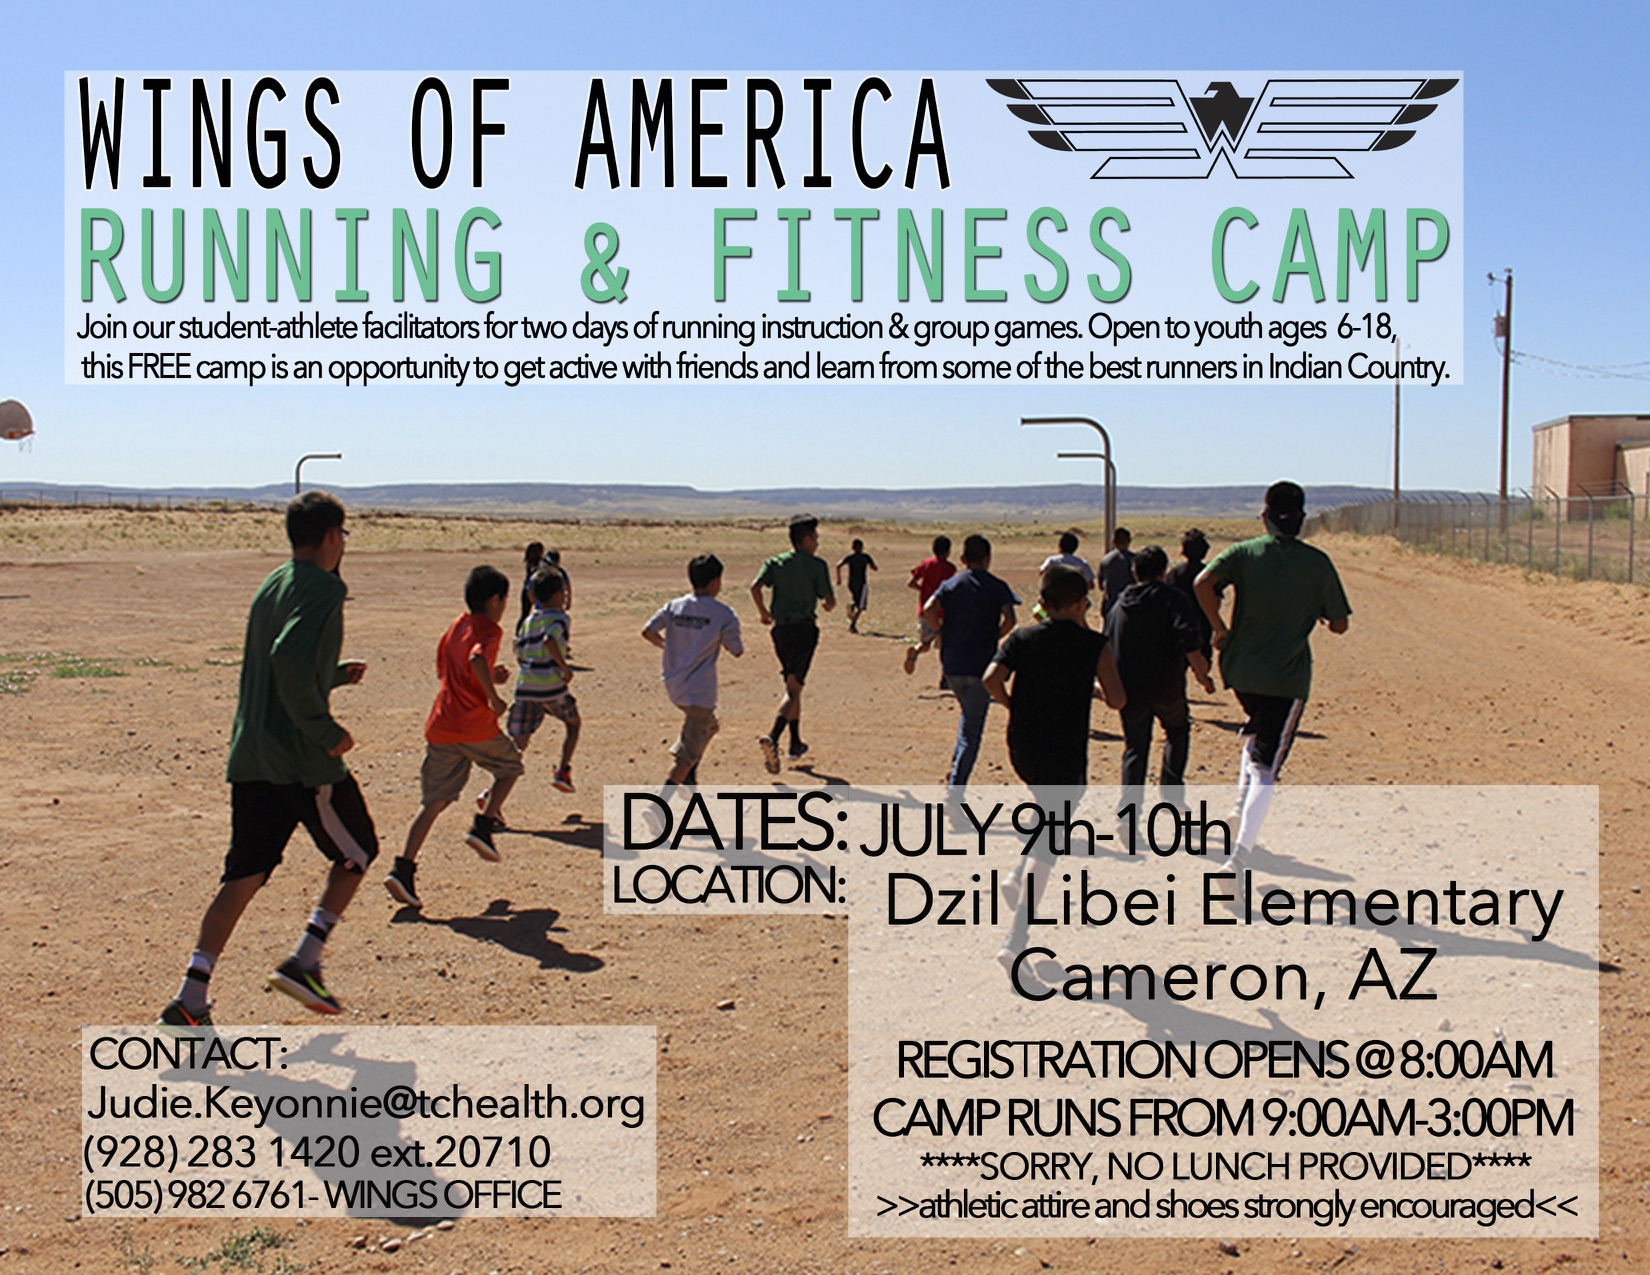 Running and Fitness Camp Cameron, AZ @ Dzil Libei Elementary School